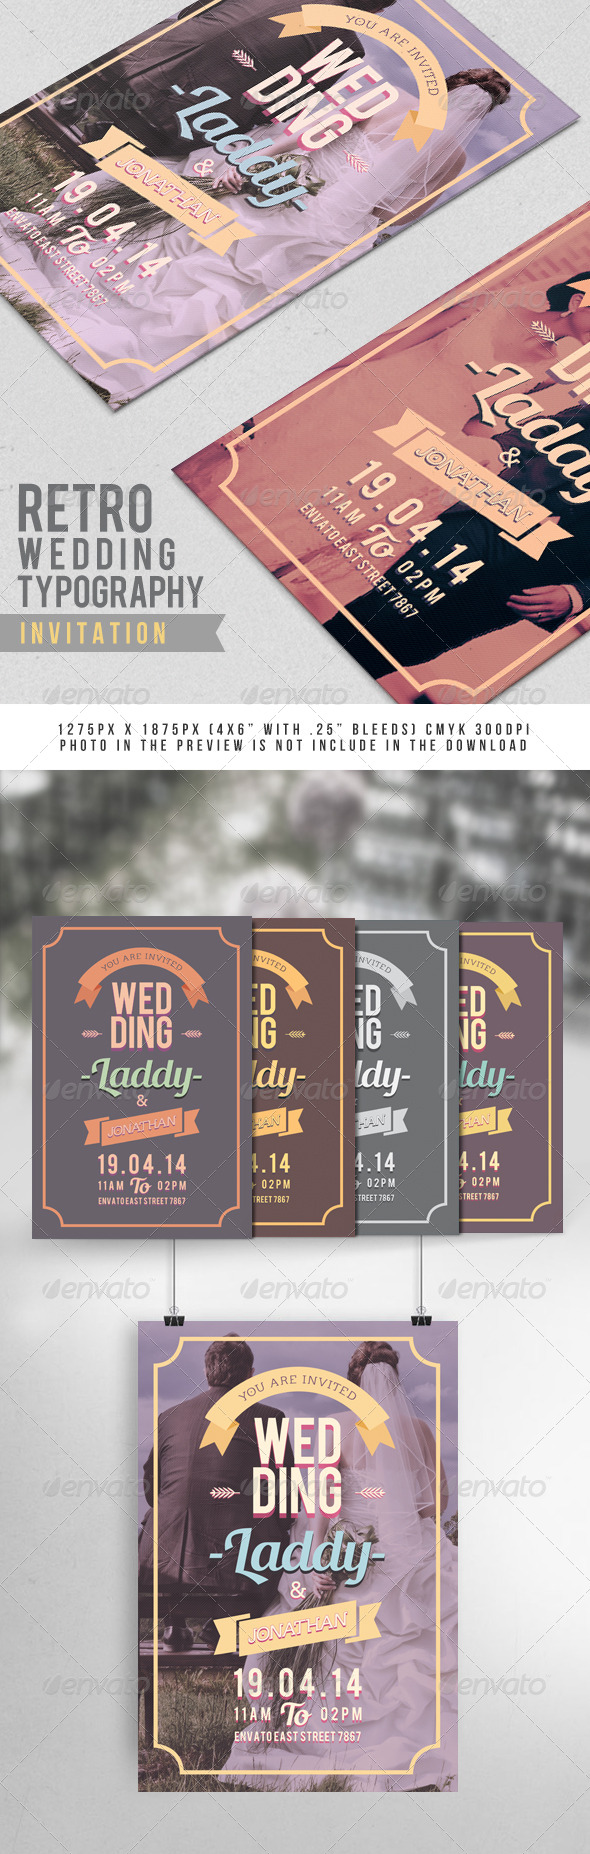 Retro Wedding Typography Invitation